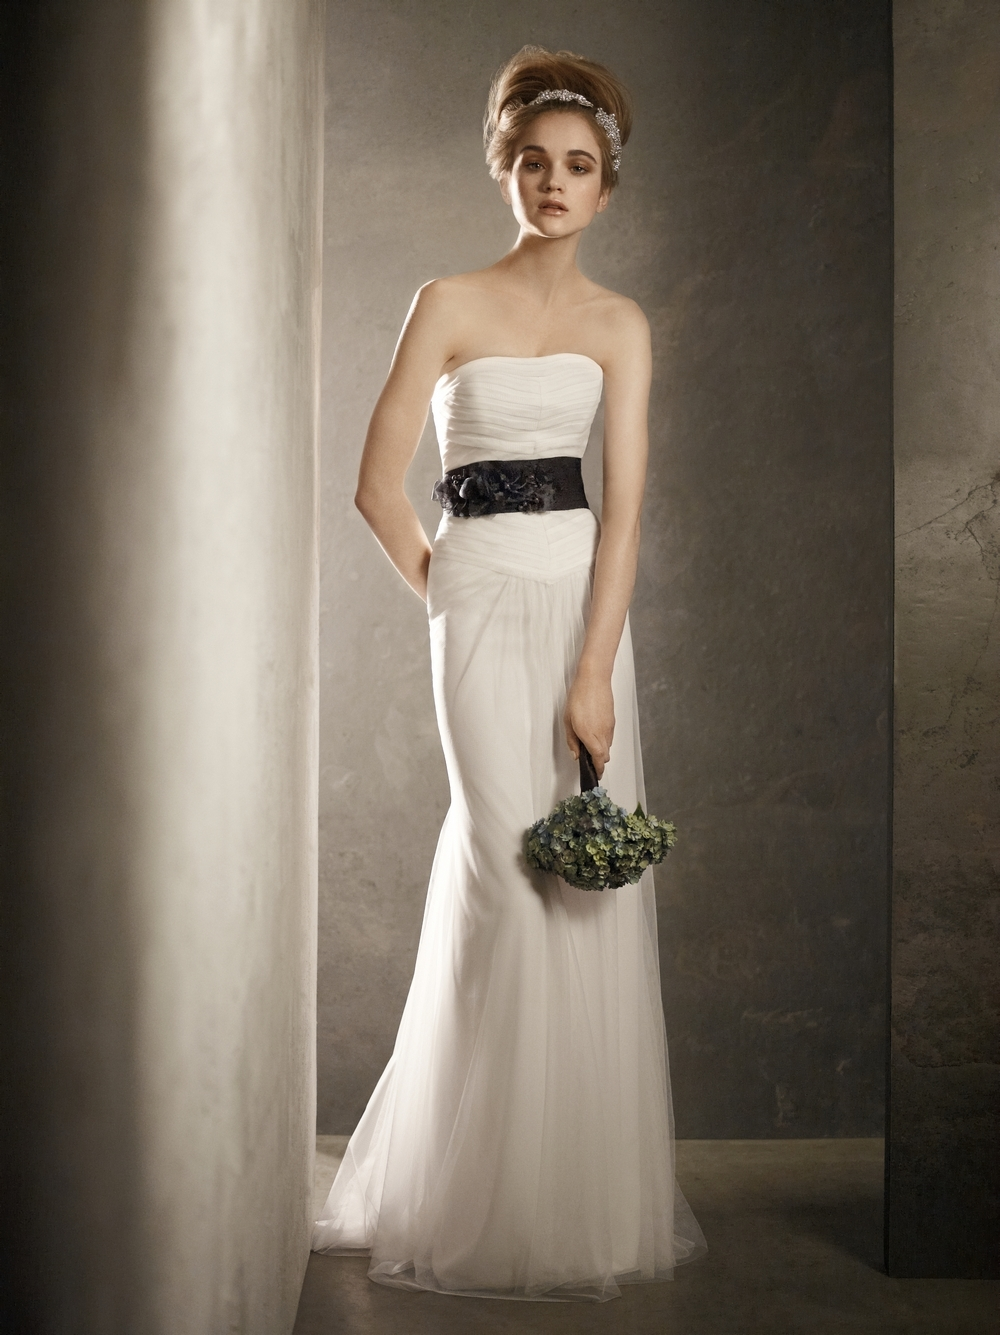 sweetheart mermaid wedding dresses black mermaid wedding dresses Beautiful Cap Sleeve Sweetheart Wedding Dresses Sequins